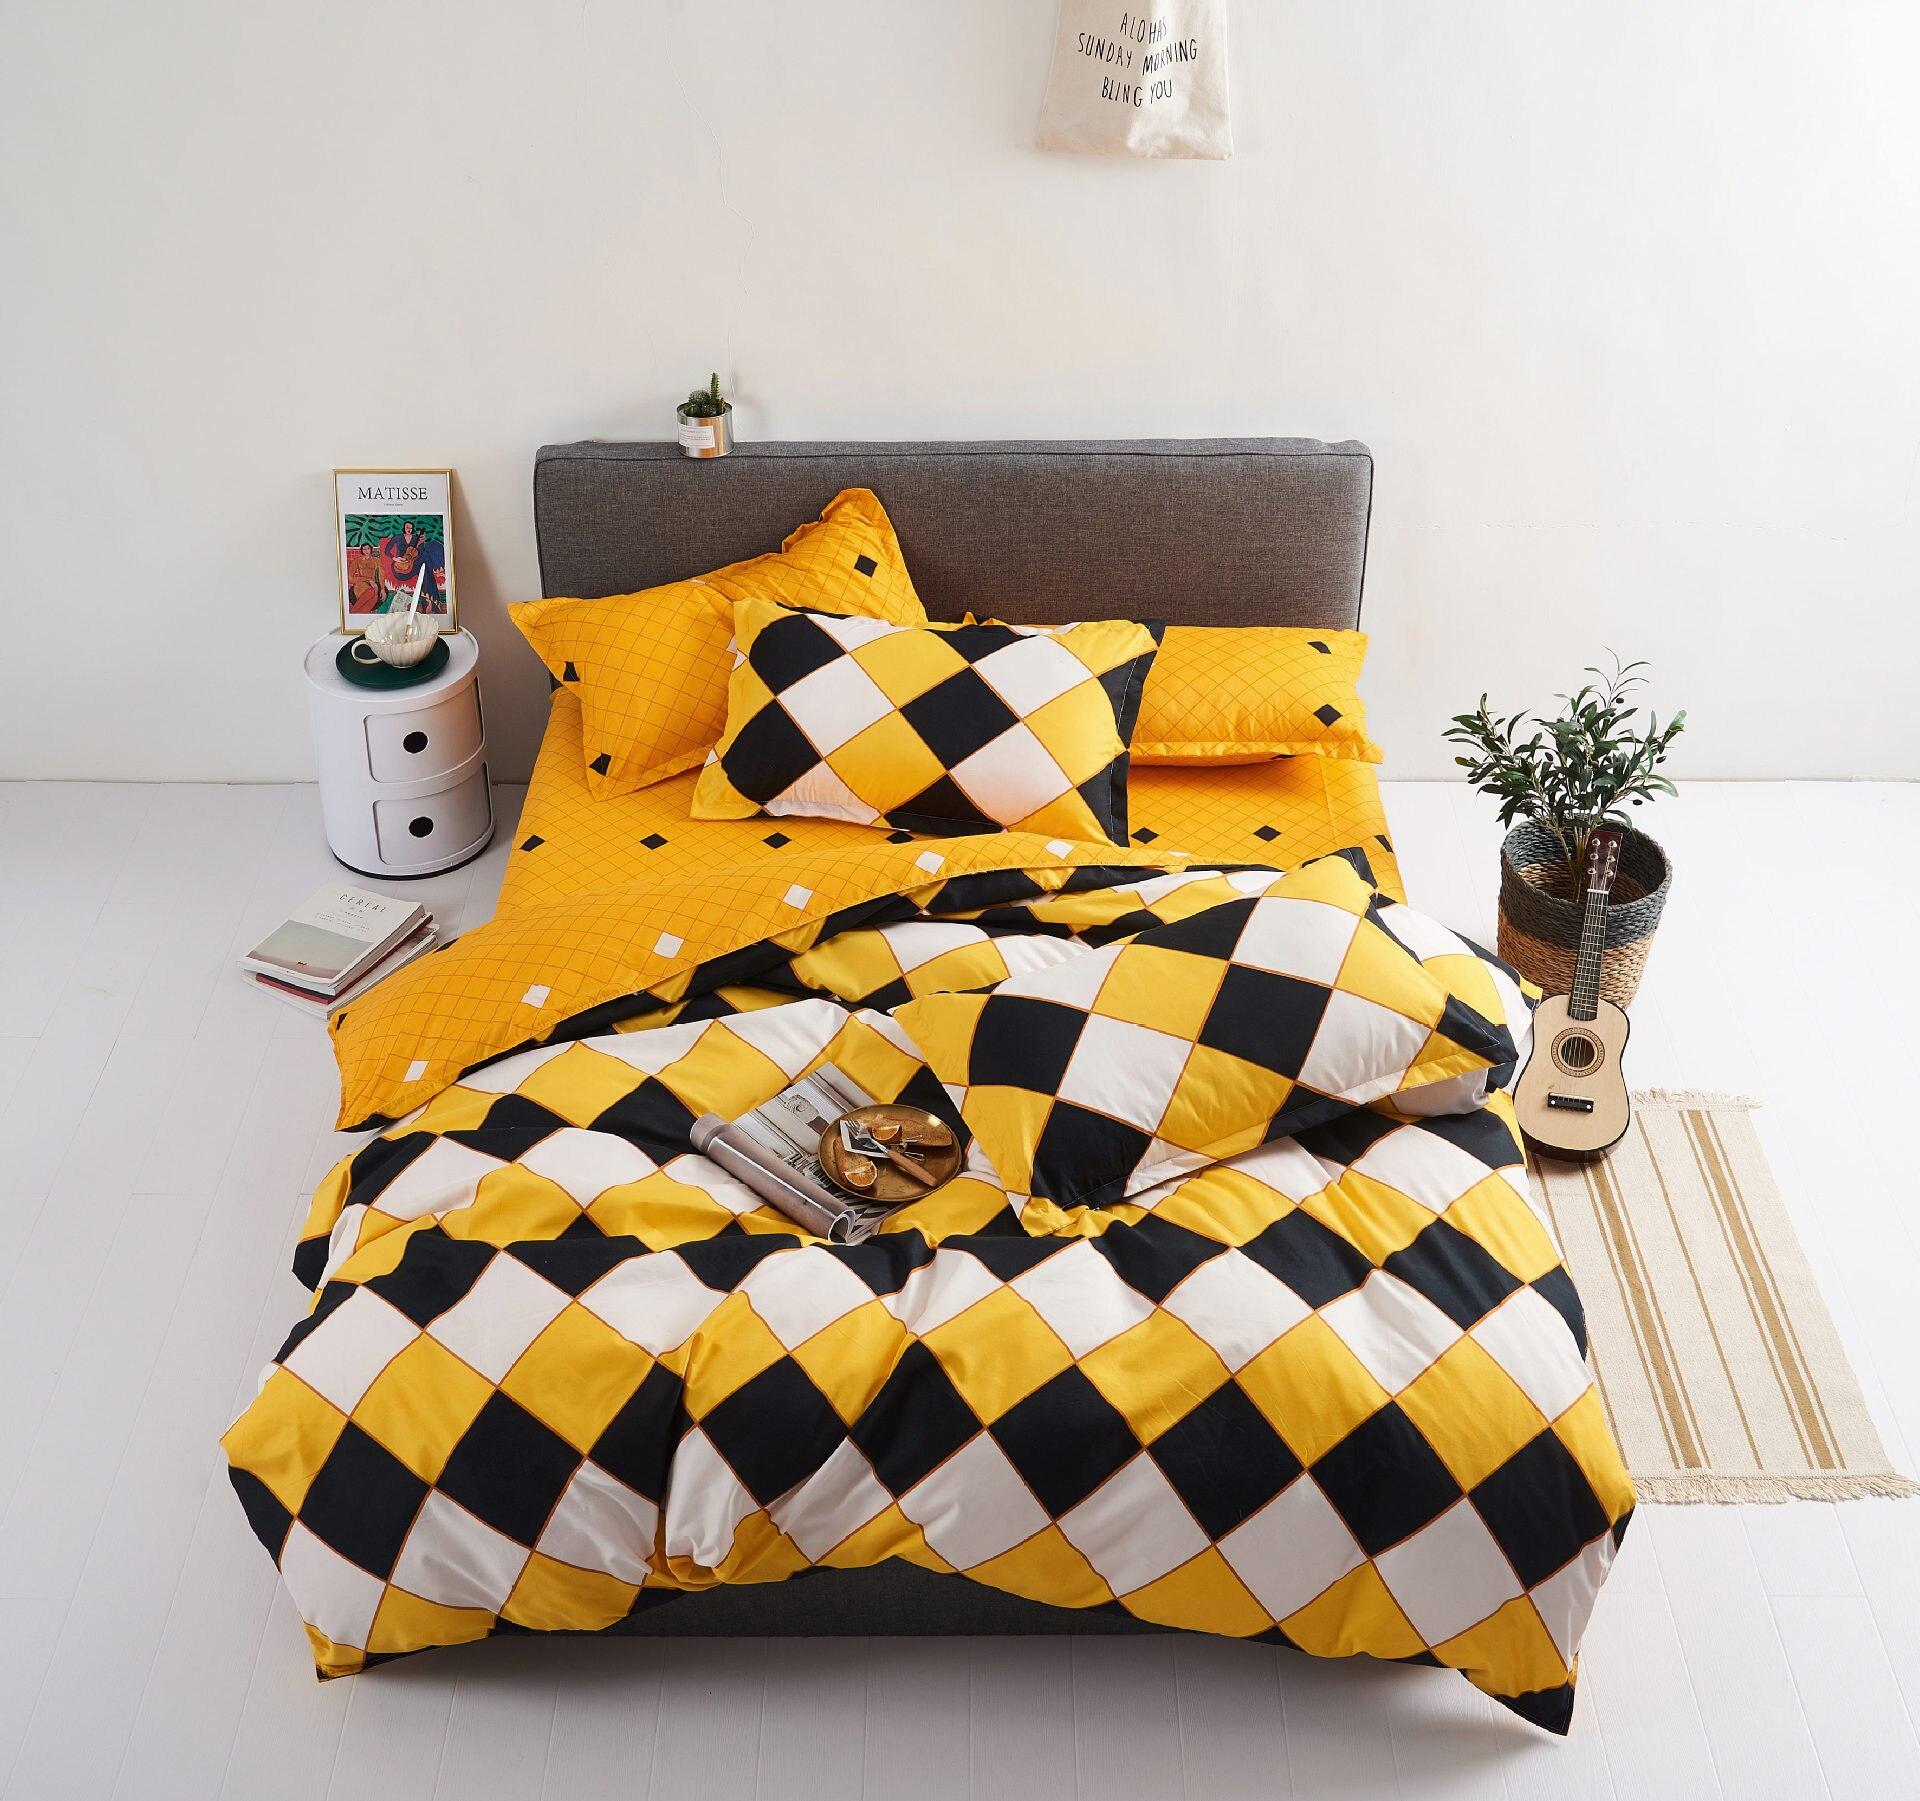 Europe, America,Japan Edinburgh Sheet Full Size Pillowcase&Duvet Cover Sets 3&4 pcs bedding set luxury